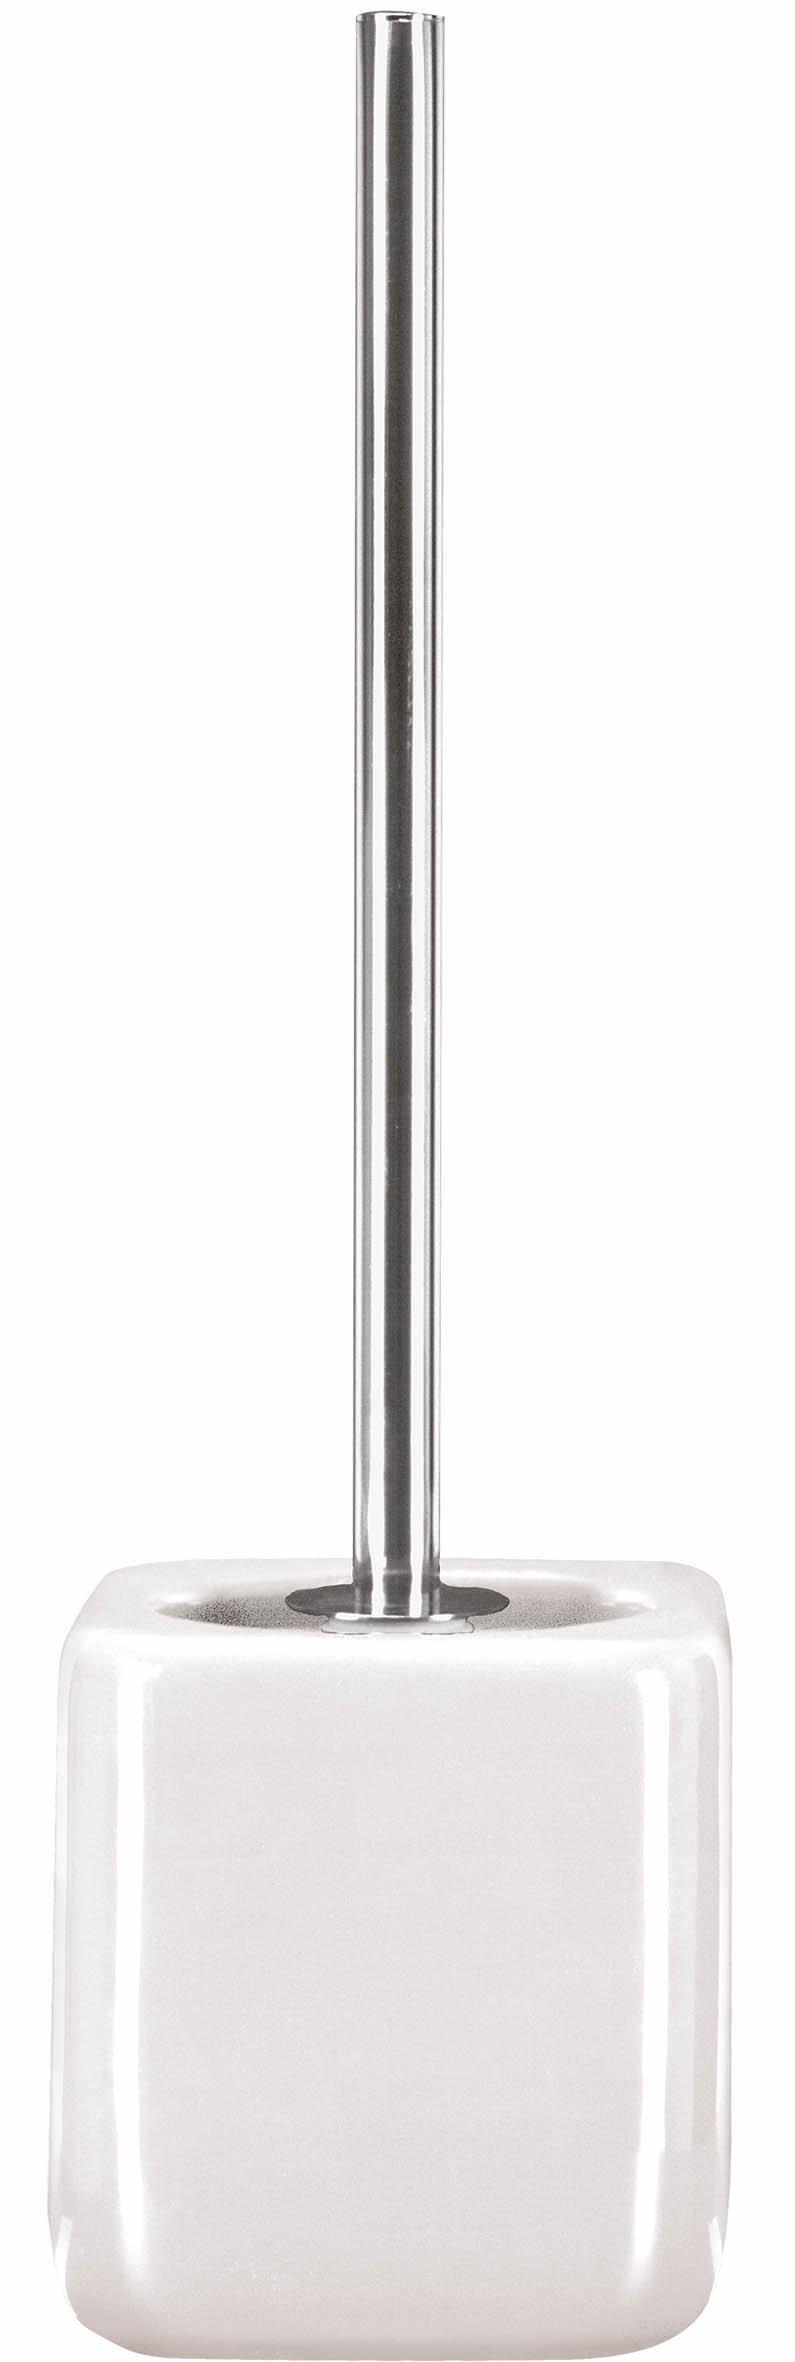 WC-Bürstenhalter Edit Weiss B:11,5cm